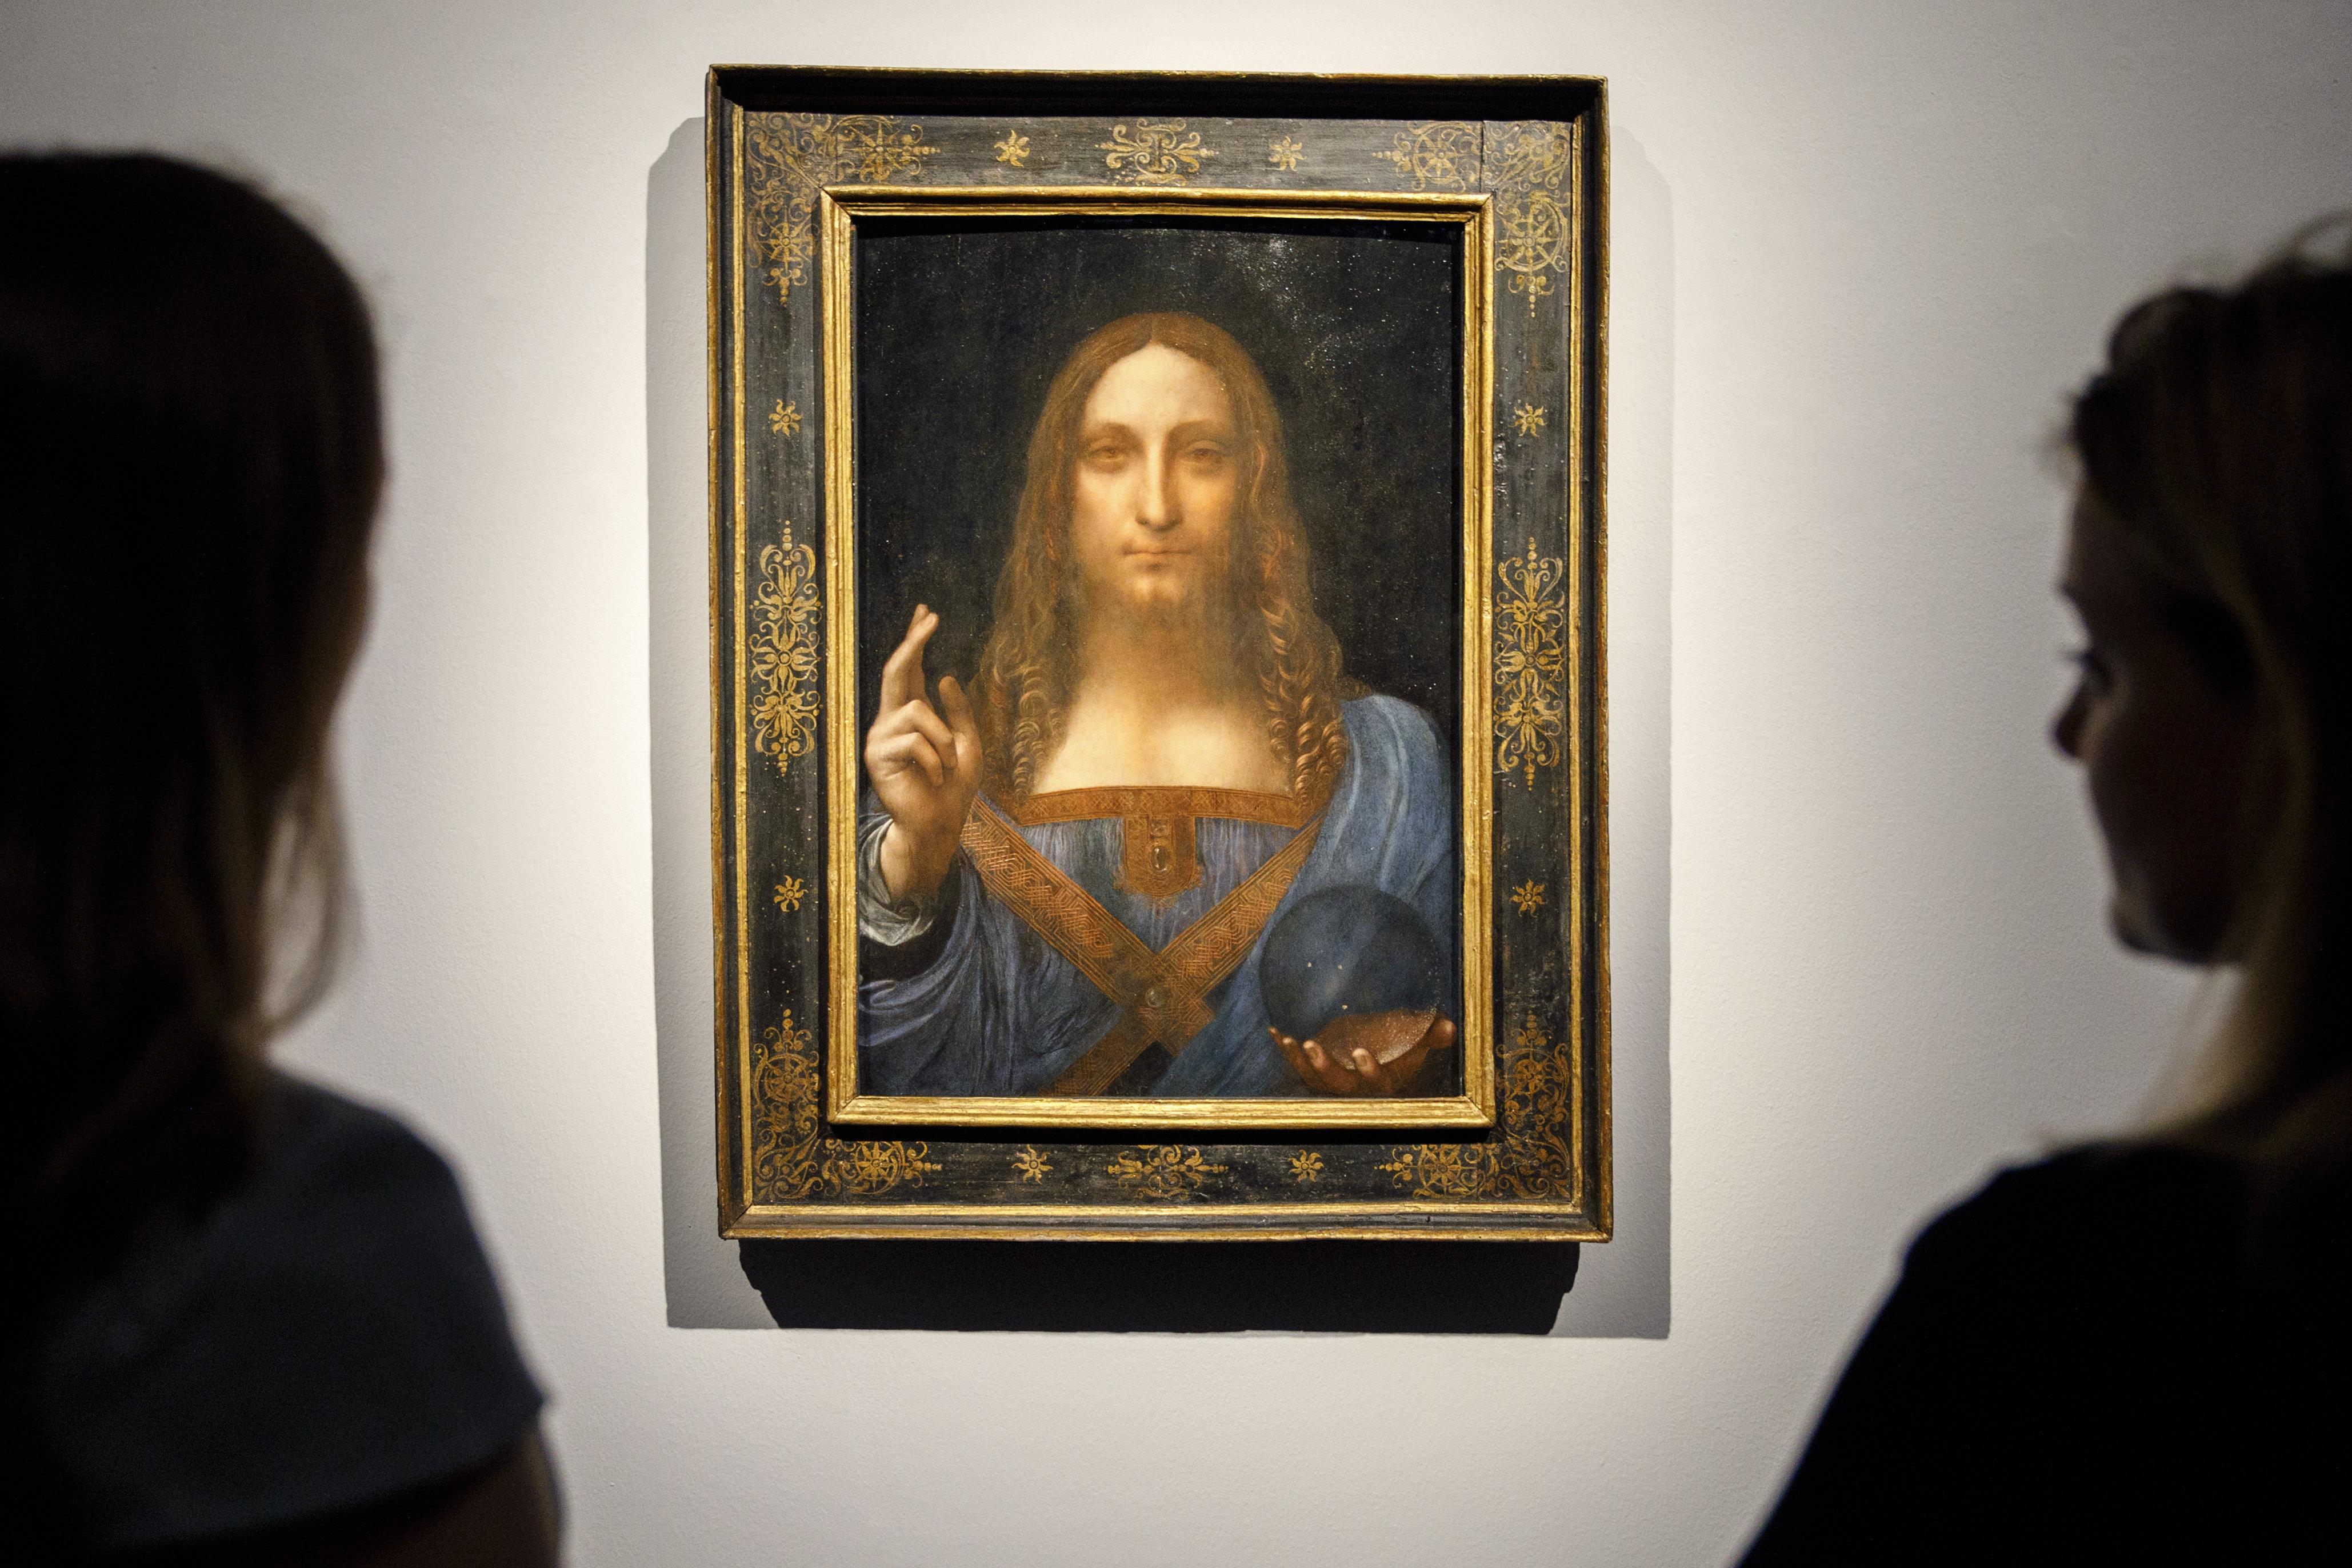 photo 1. Painting attributed to Leonardo da Vinci, Salvator Mundi — 450.3 million